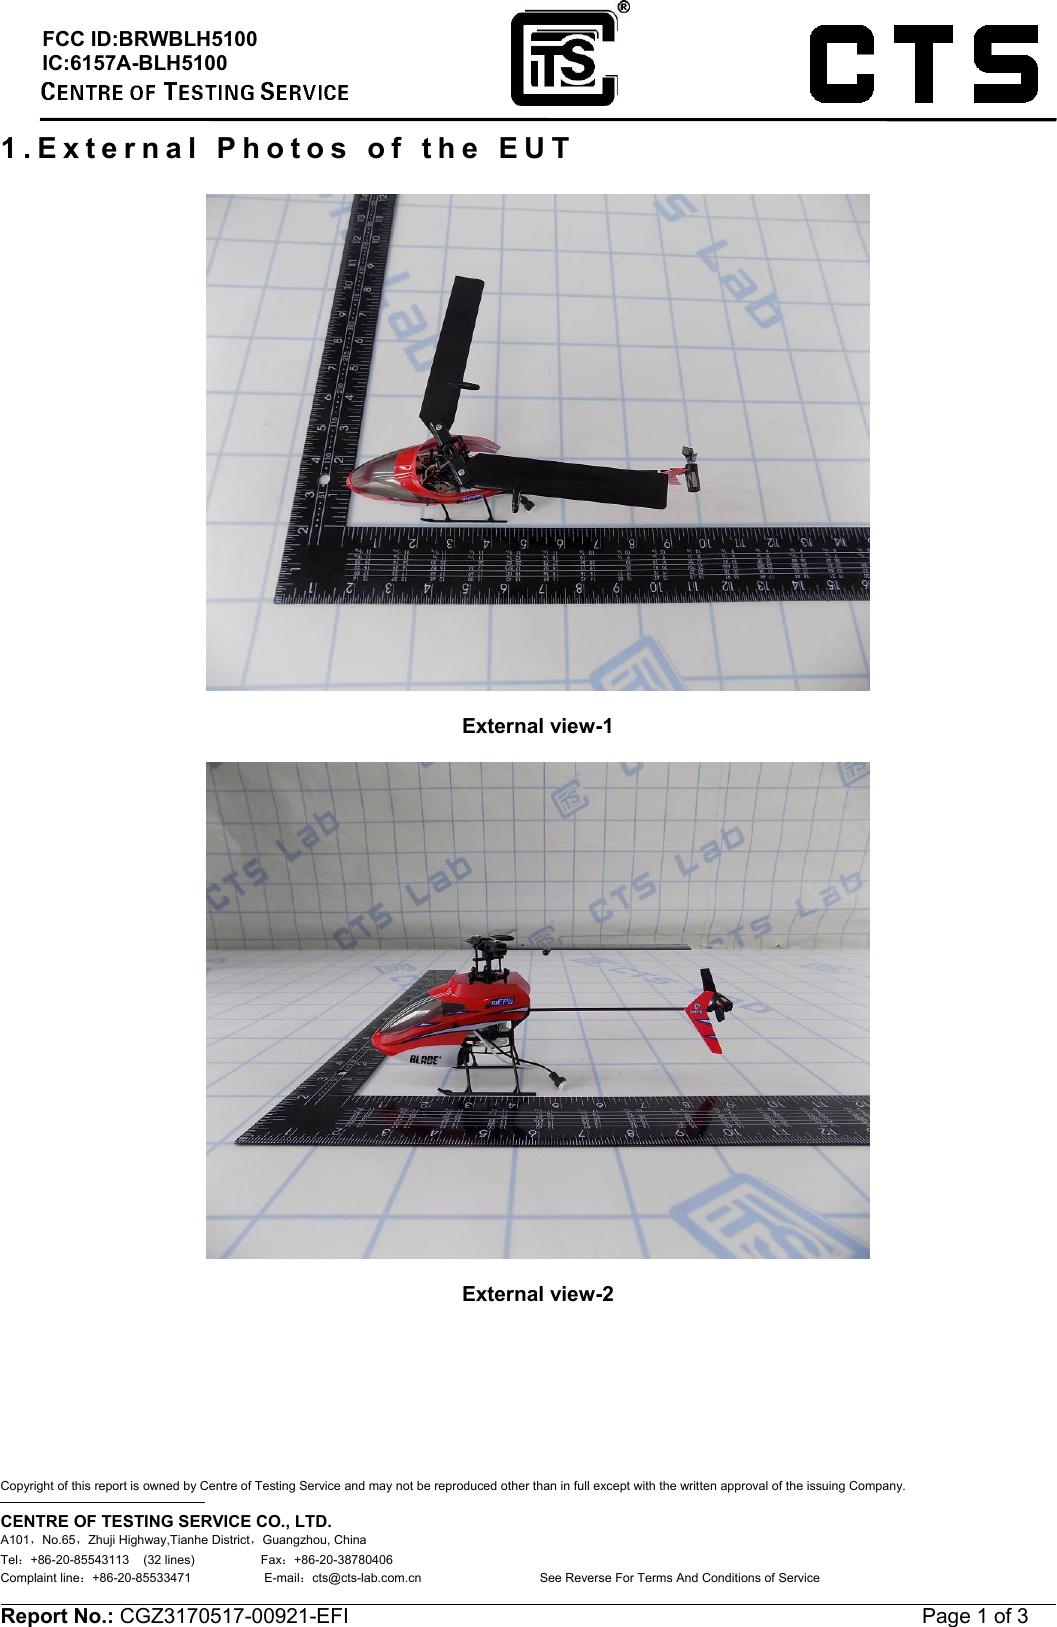 horizon bq-270 operational manual